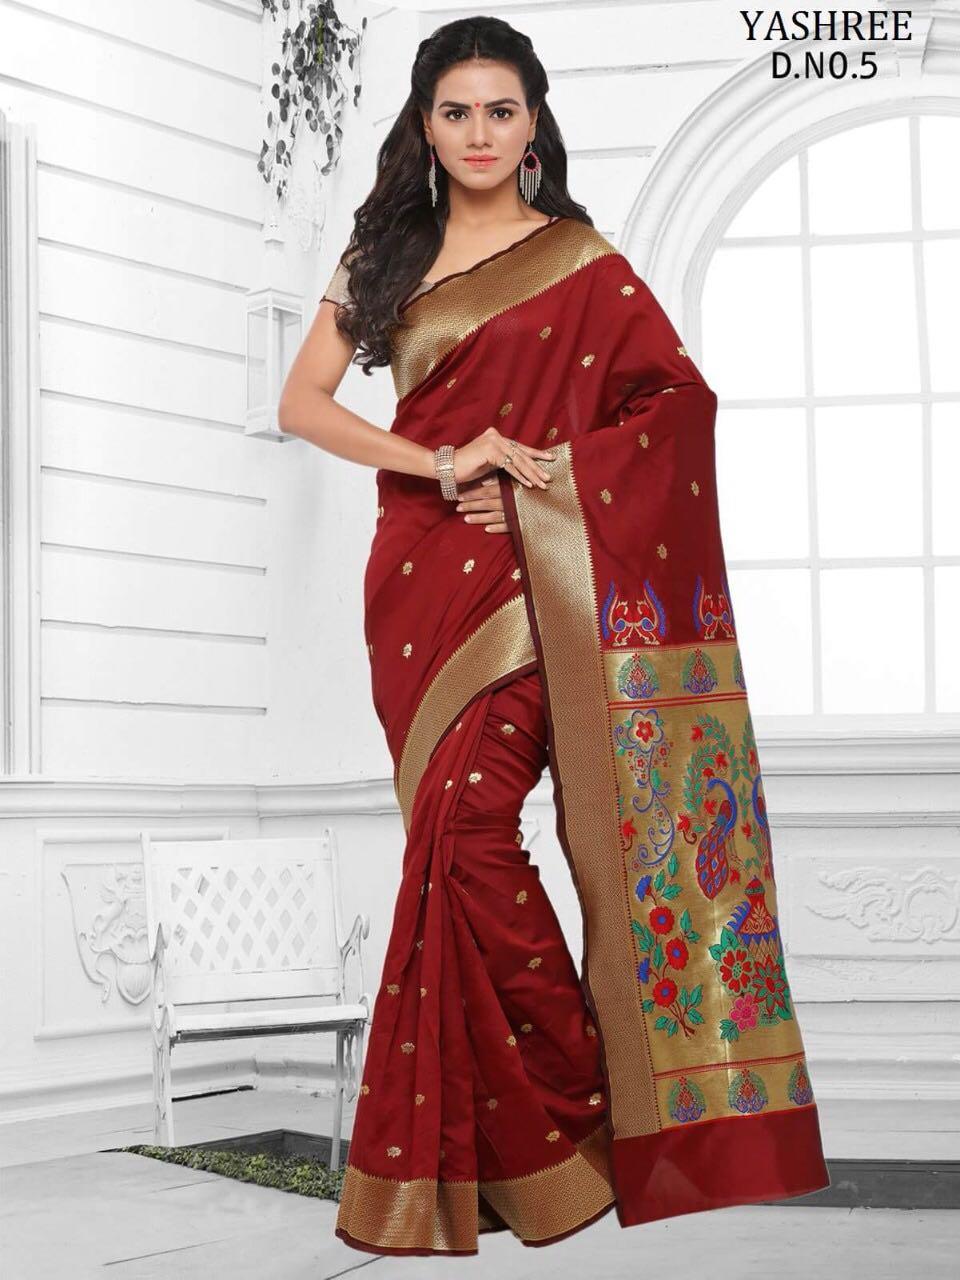 Yadunandan Fashion Yashree 5